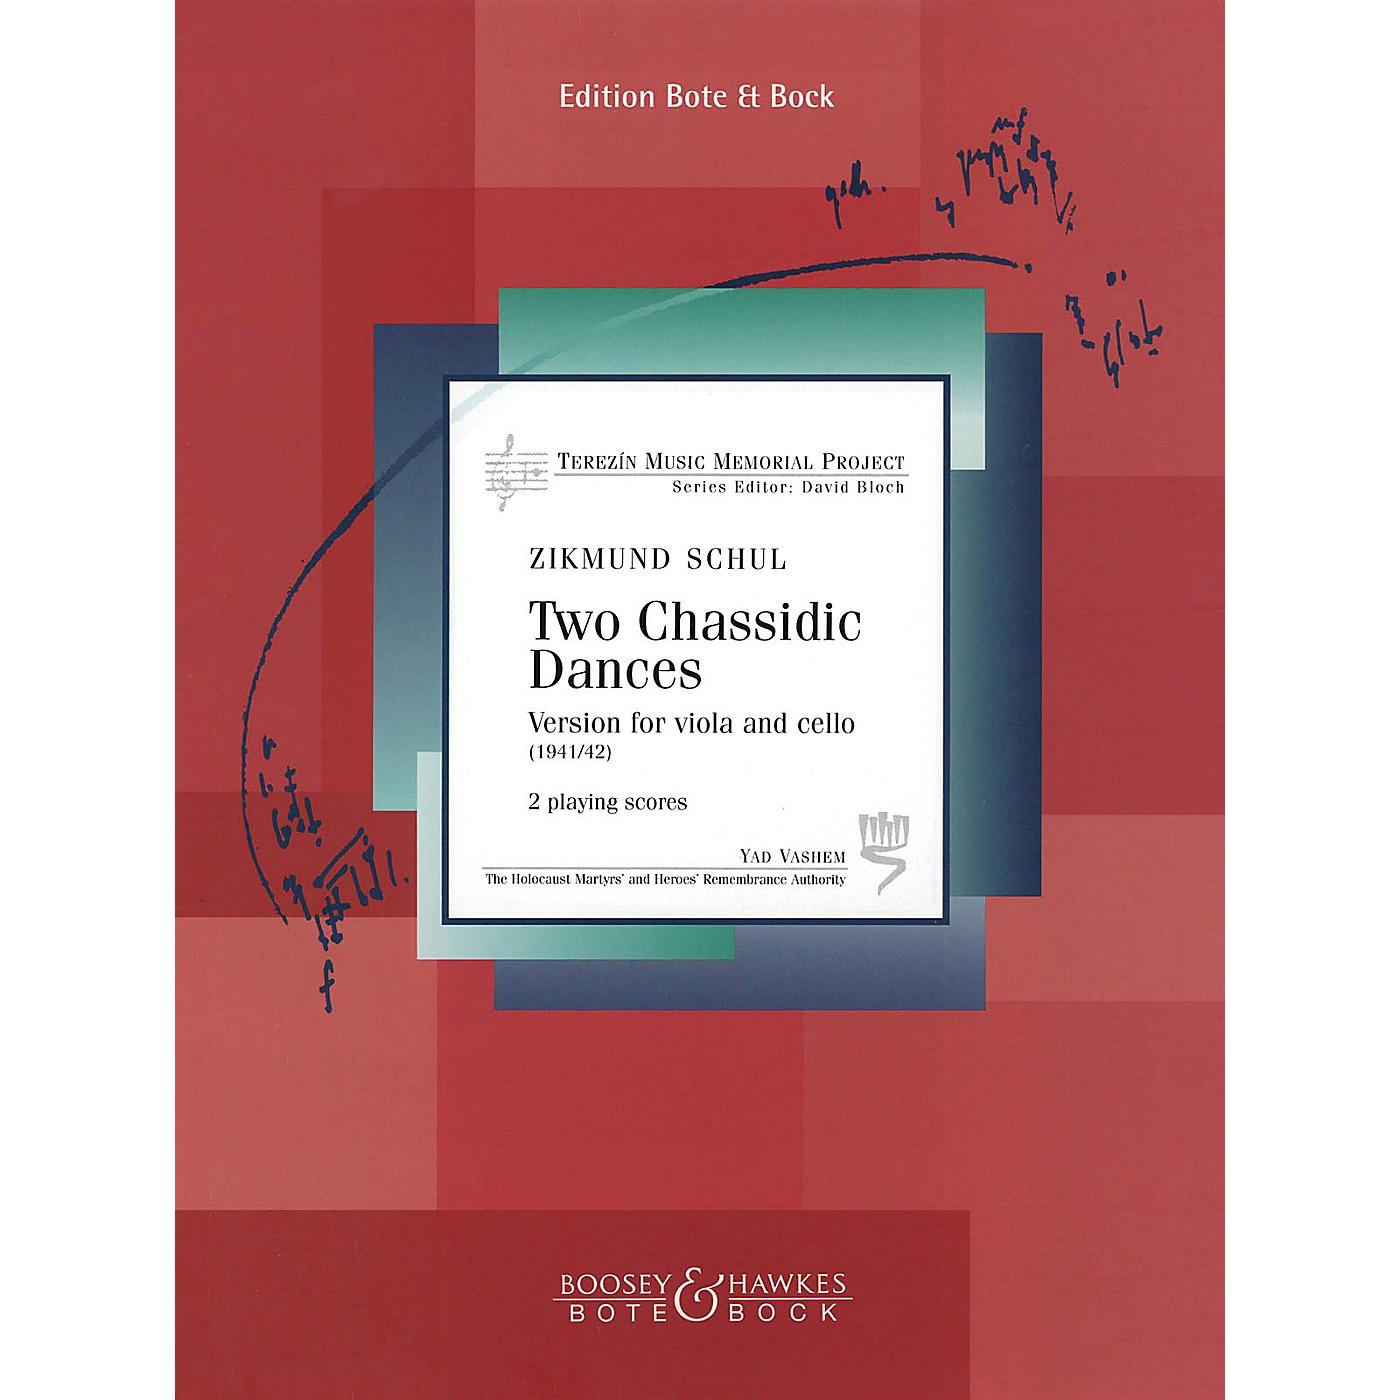 Hal Leonard Two (2) Chassidic Dances For Viola And Cello (1941/42) Terezin Memorial Project thumbnail